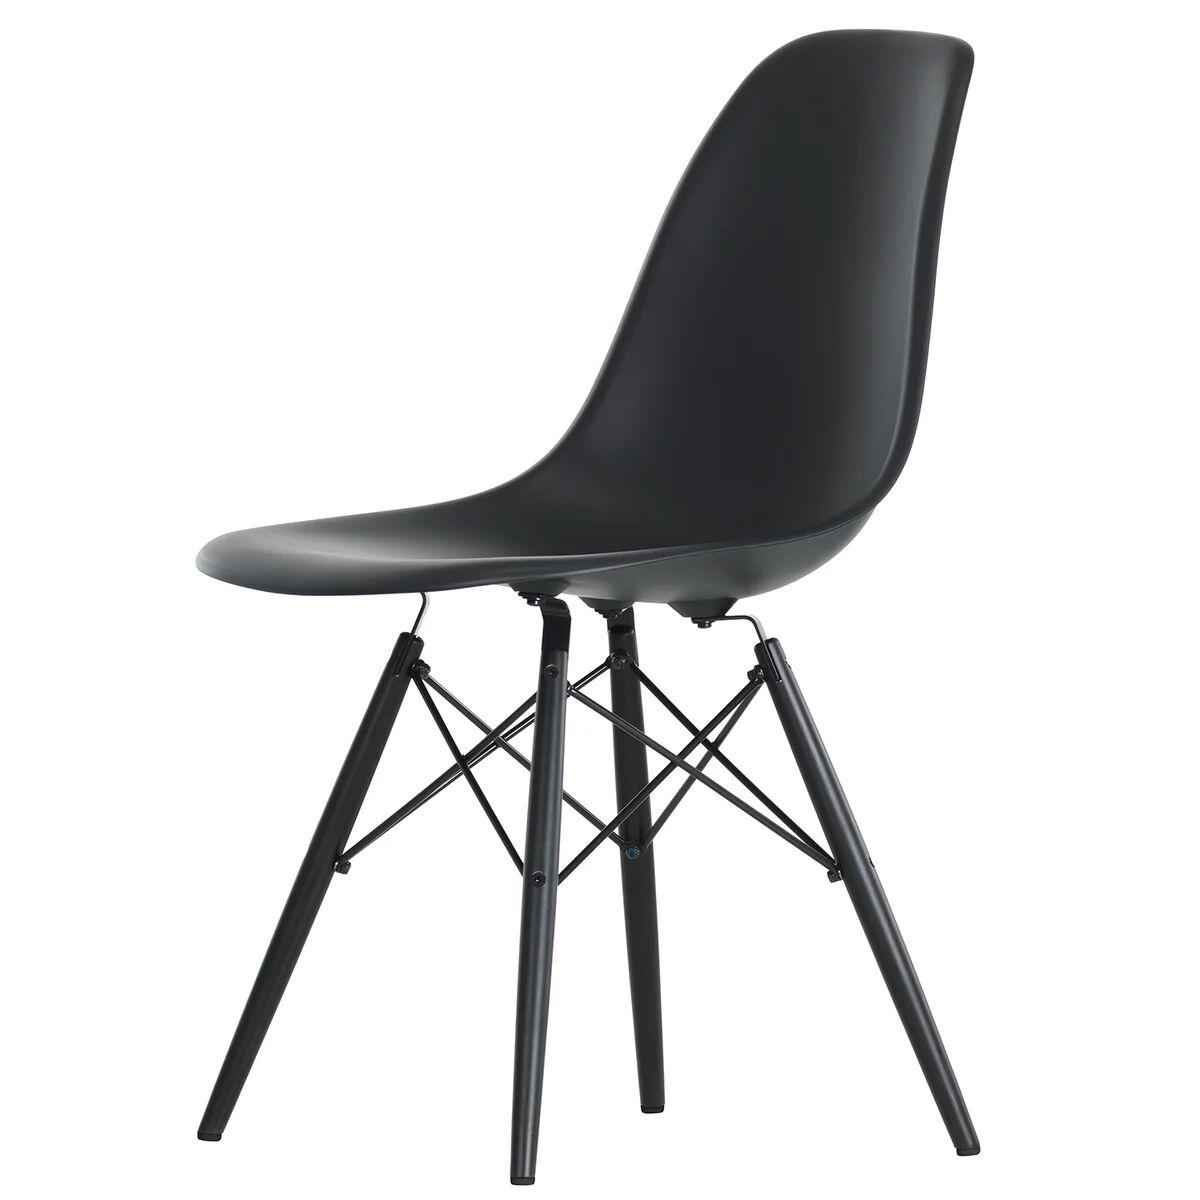 Vitra Eames DSW tuoli, basic dark - musta vaahtera